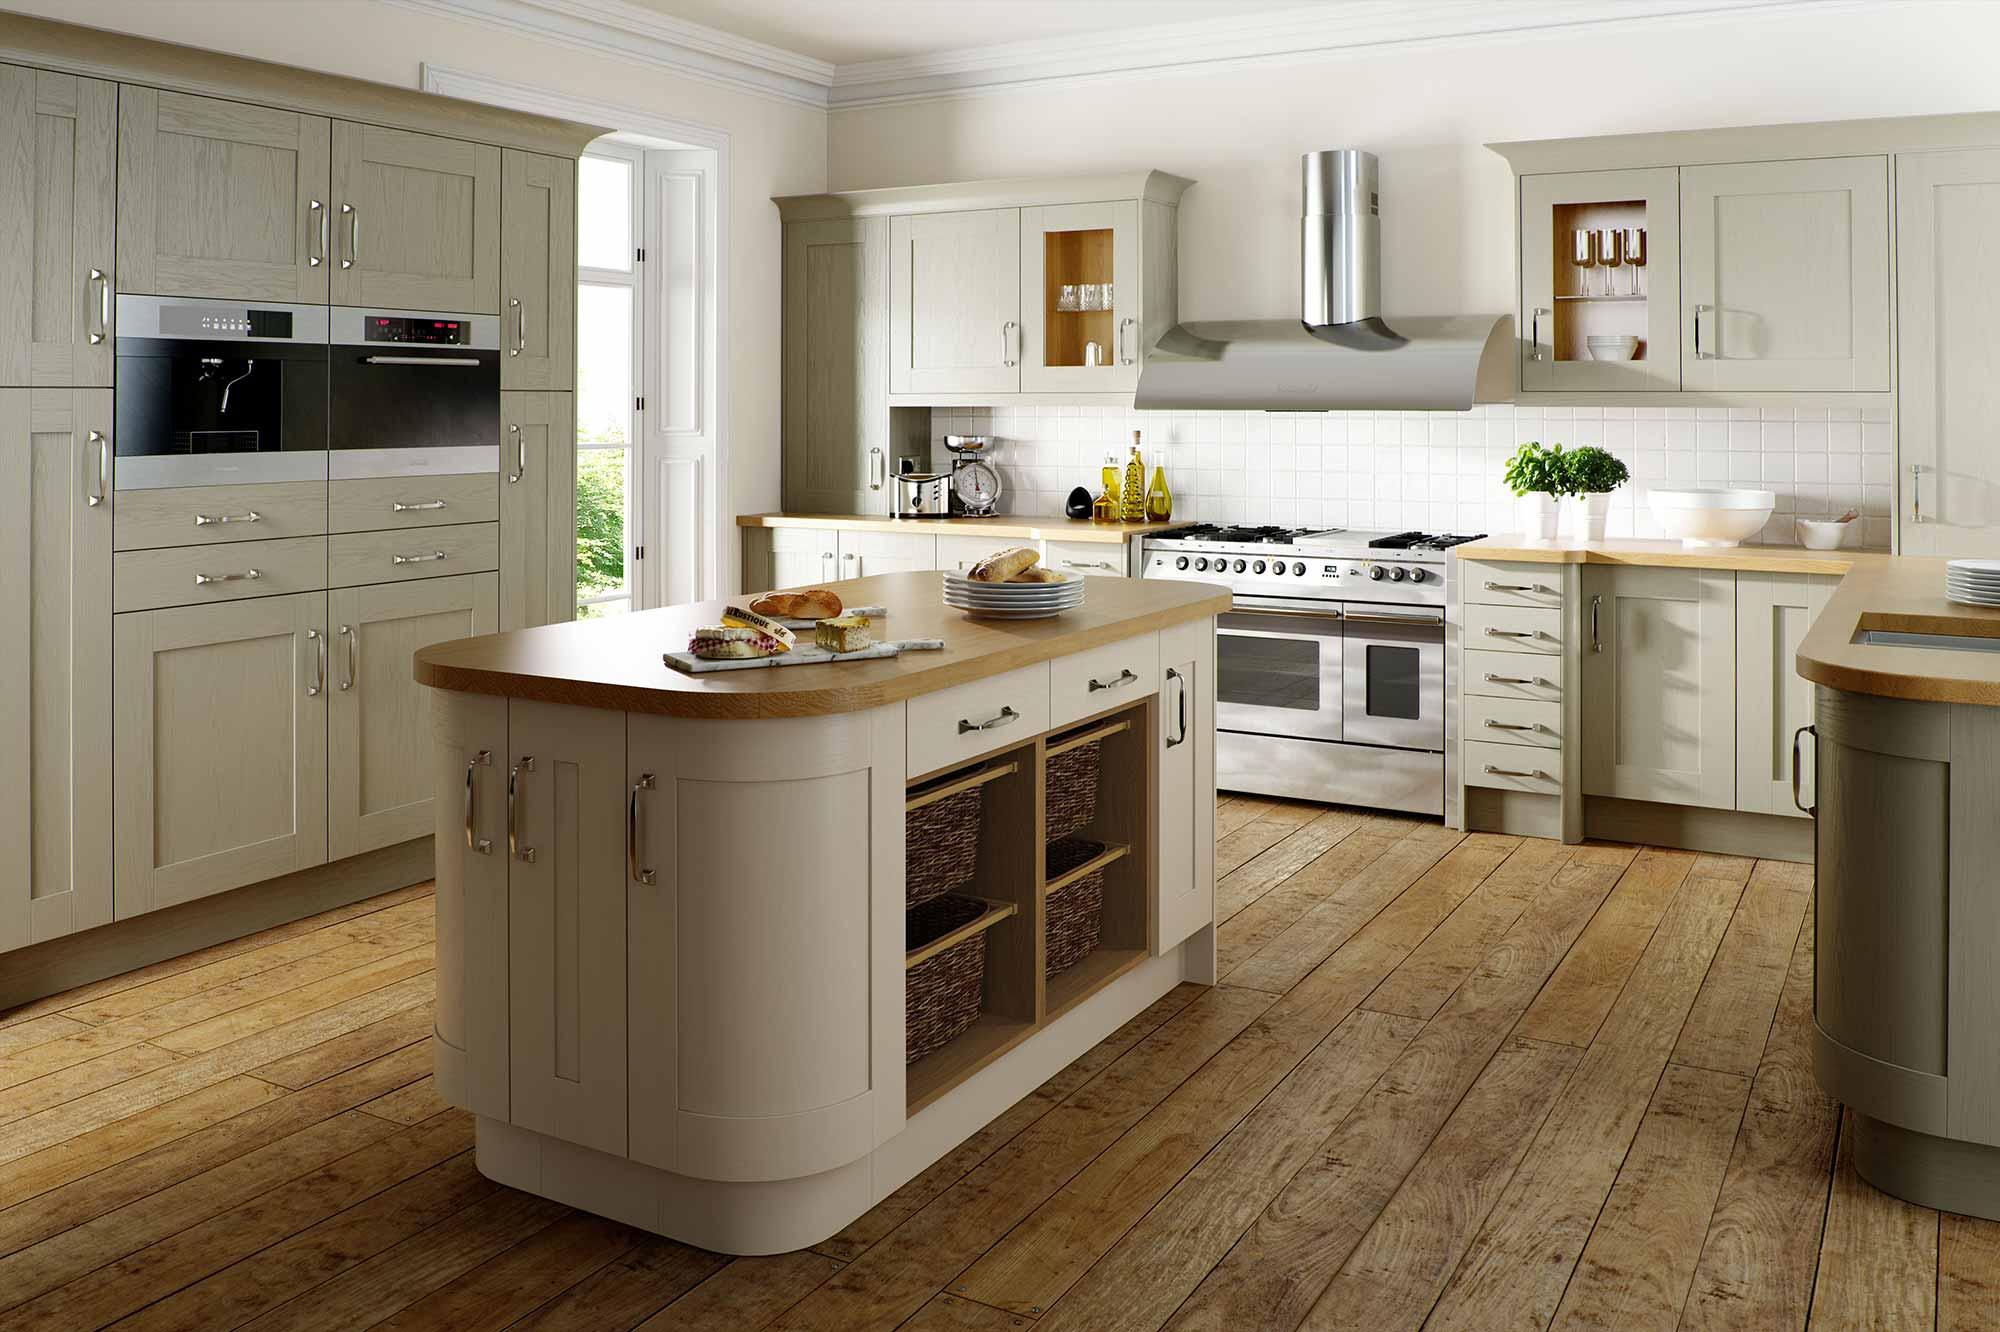 Kitchens East Kilbride 3